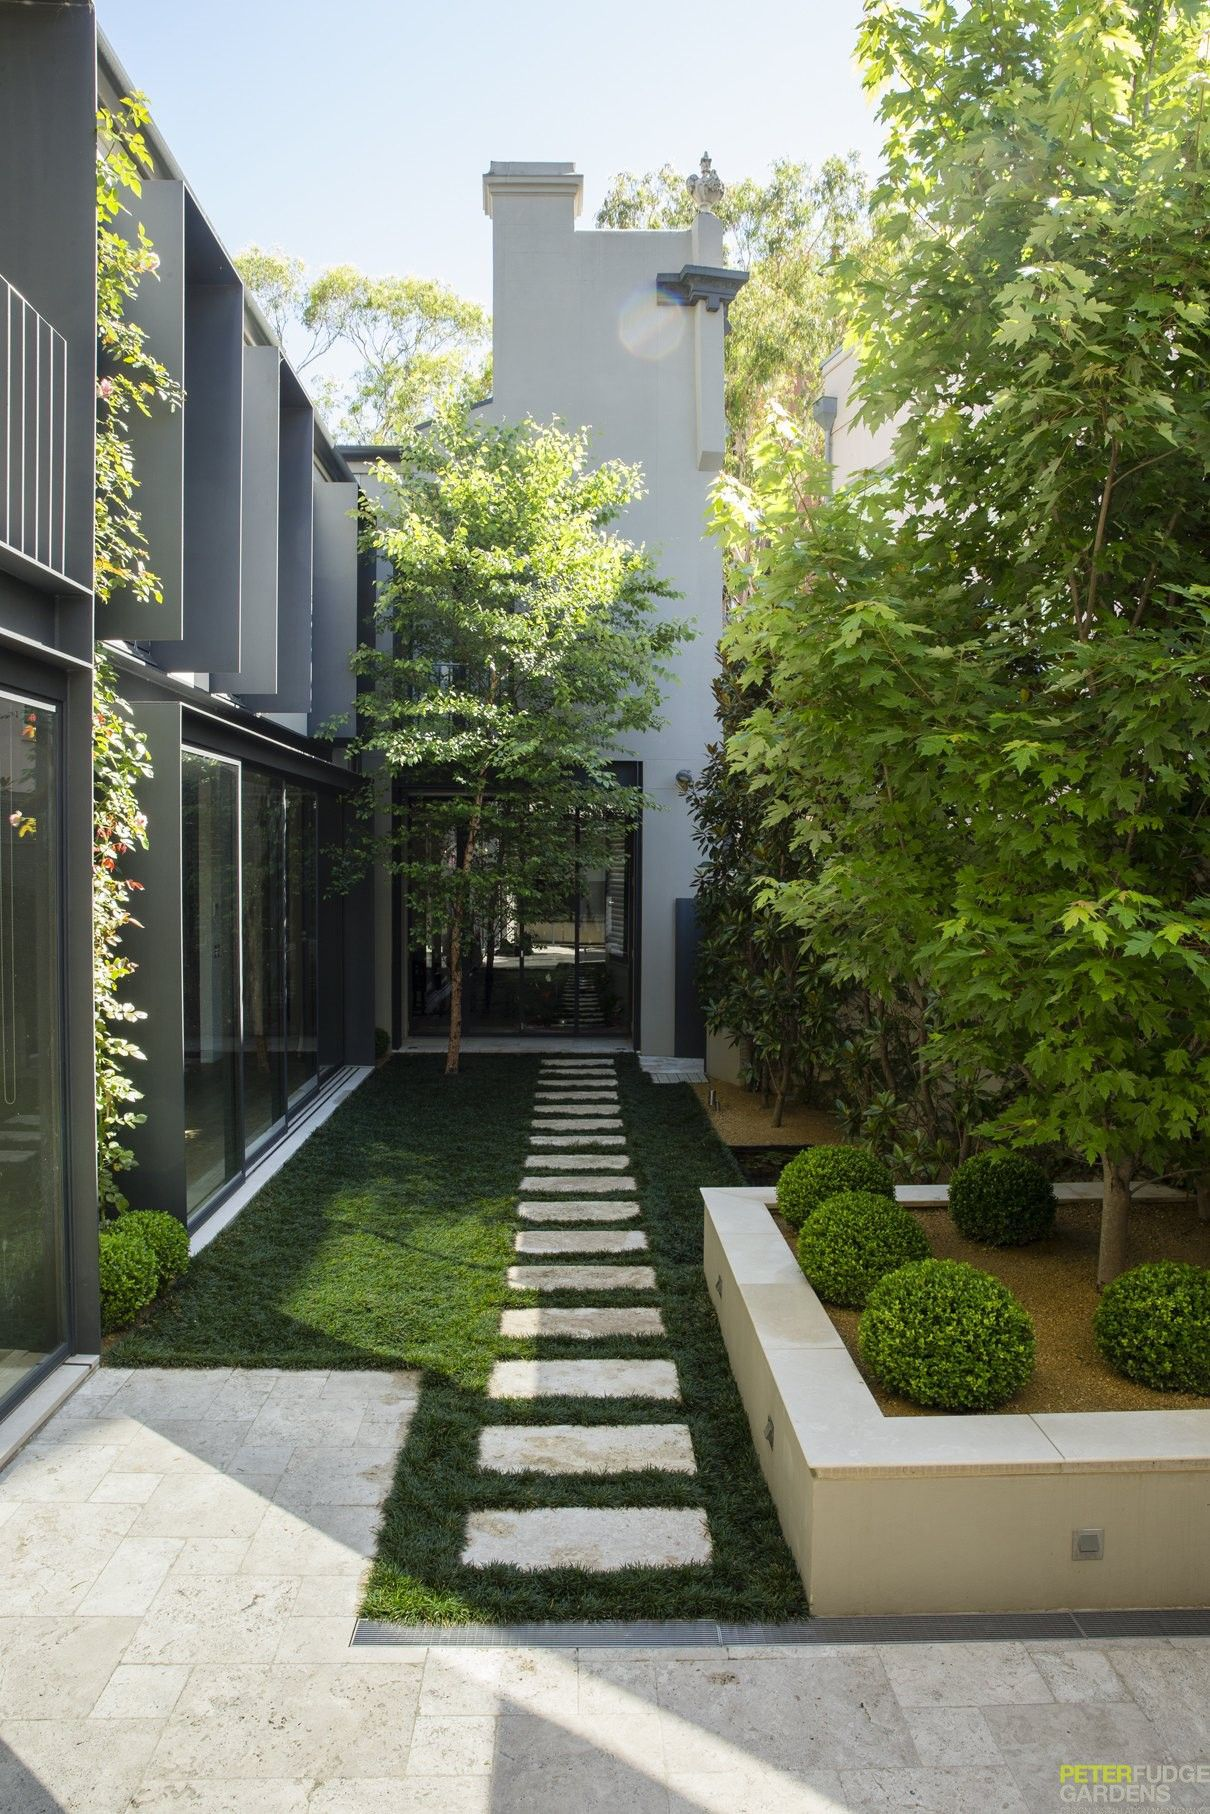 Metropolitan Courtyard ‹ Peter Fudge | Narrow garden ...